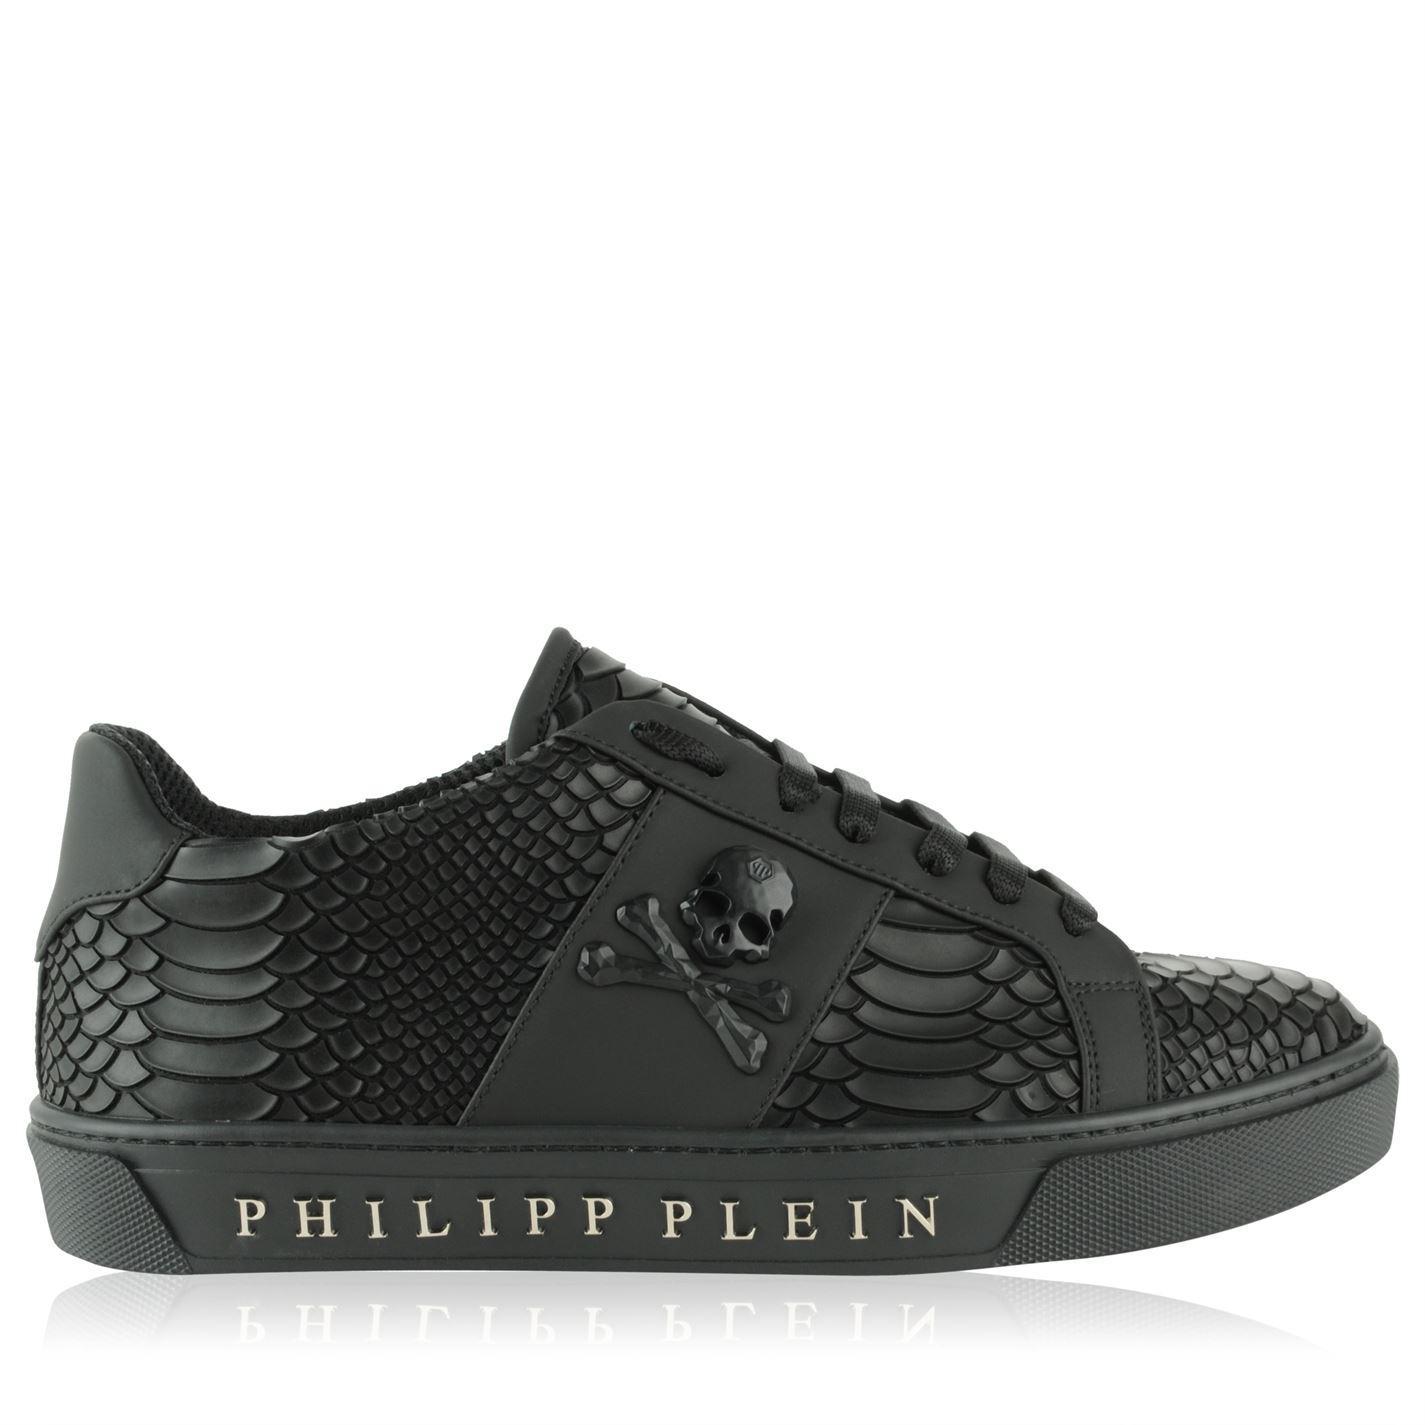 52068471500 Philipp Plein Talk Slow Trainers in Black for Men - Lyst